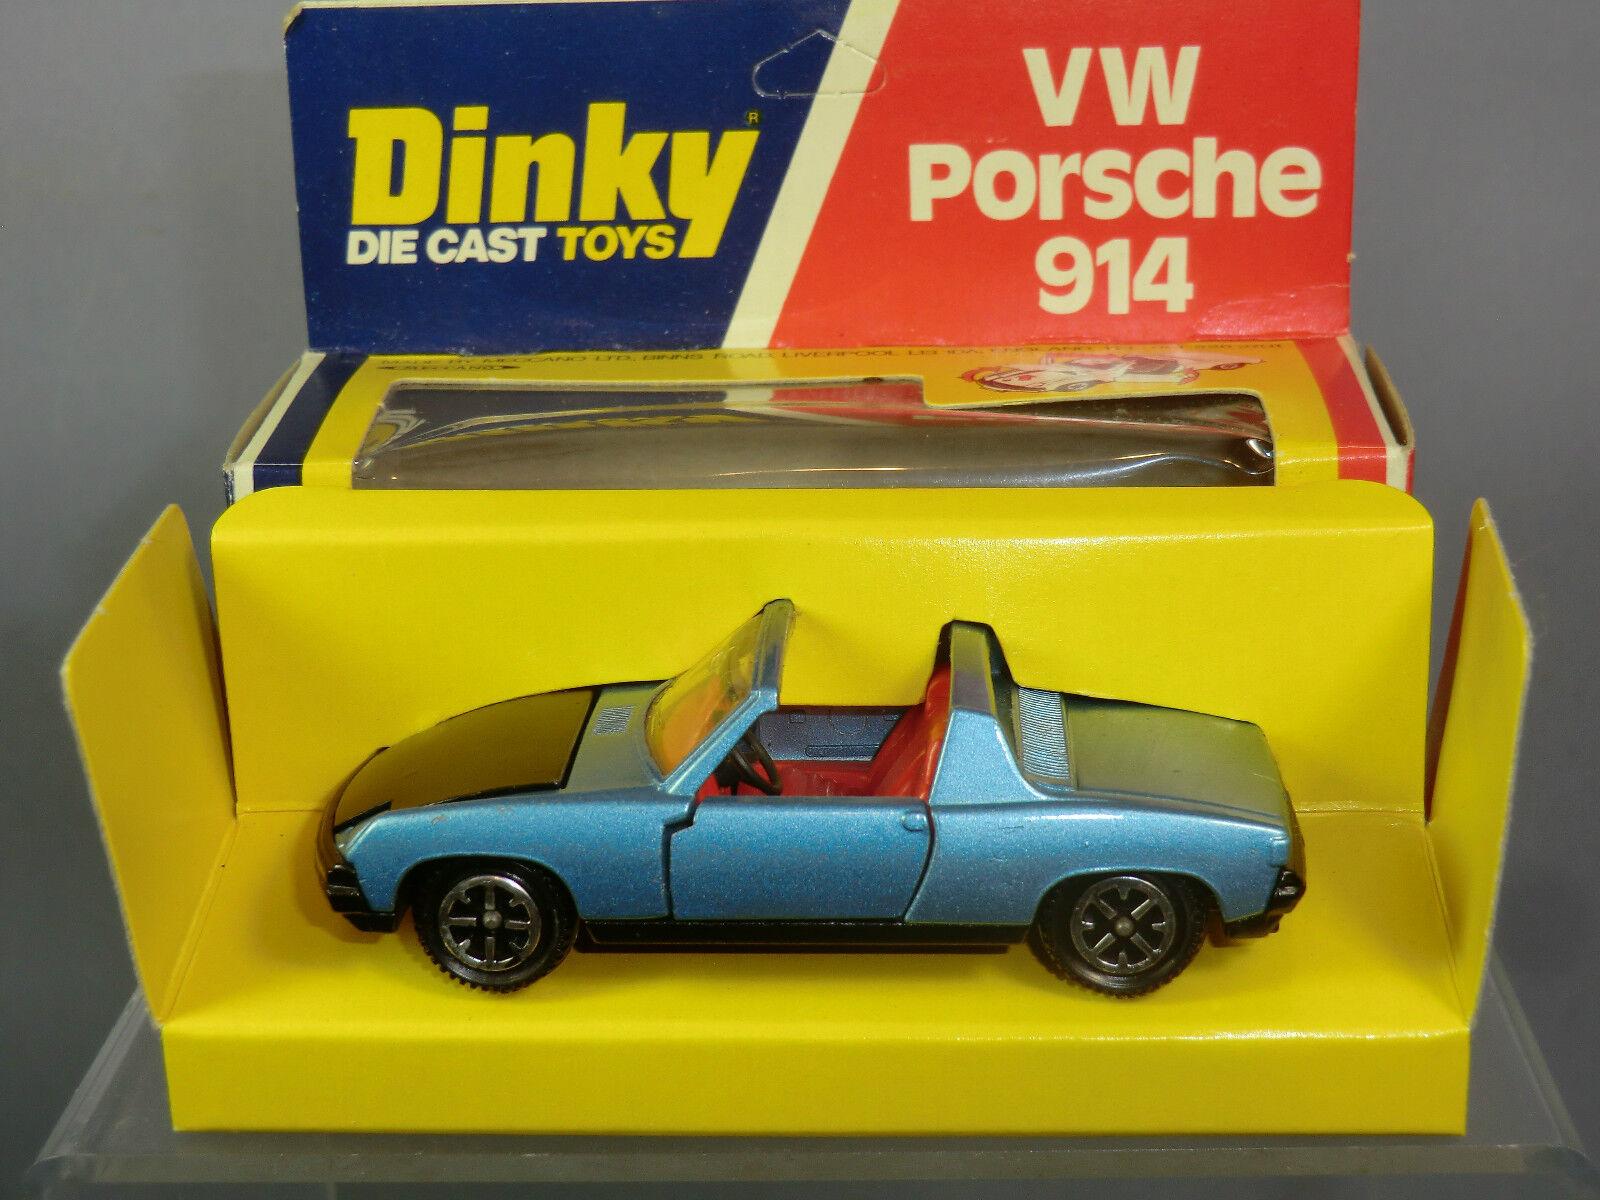 Precio por piso Dinky Juguetes Juguetes Juguetes Modelo No.208 Porsche 914 MIB  80% de descuento